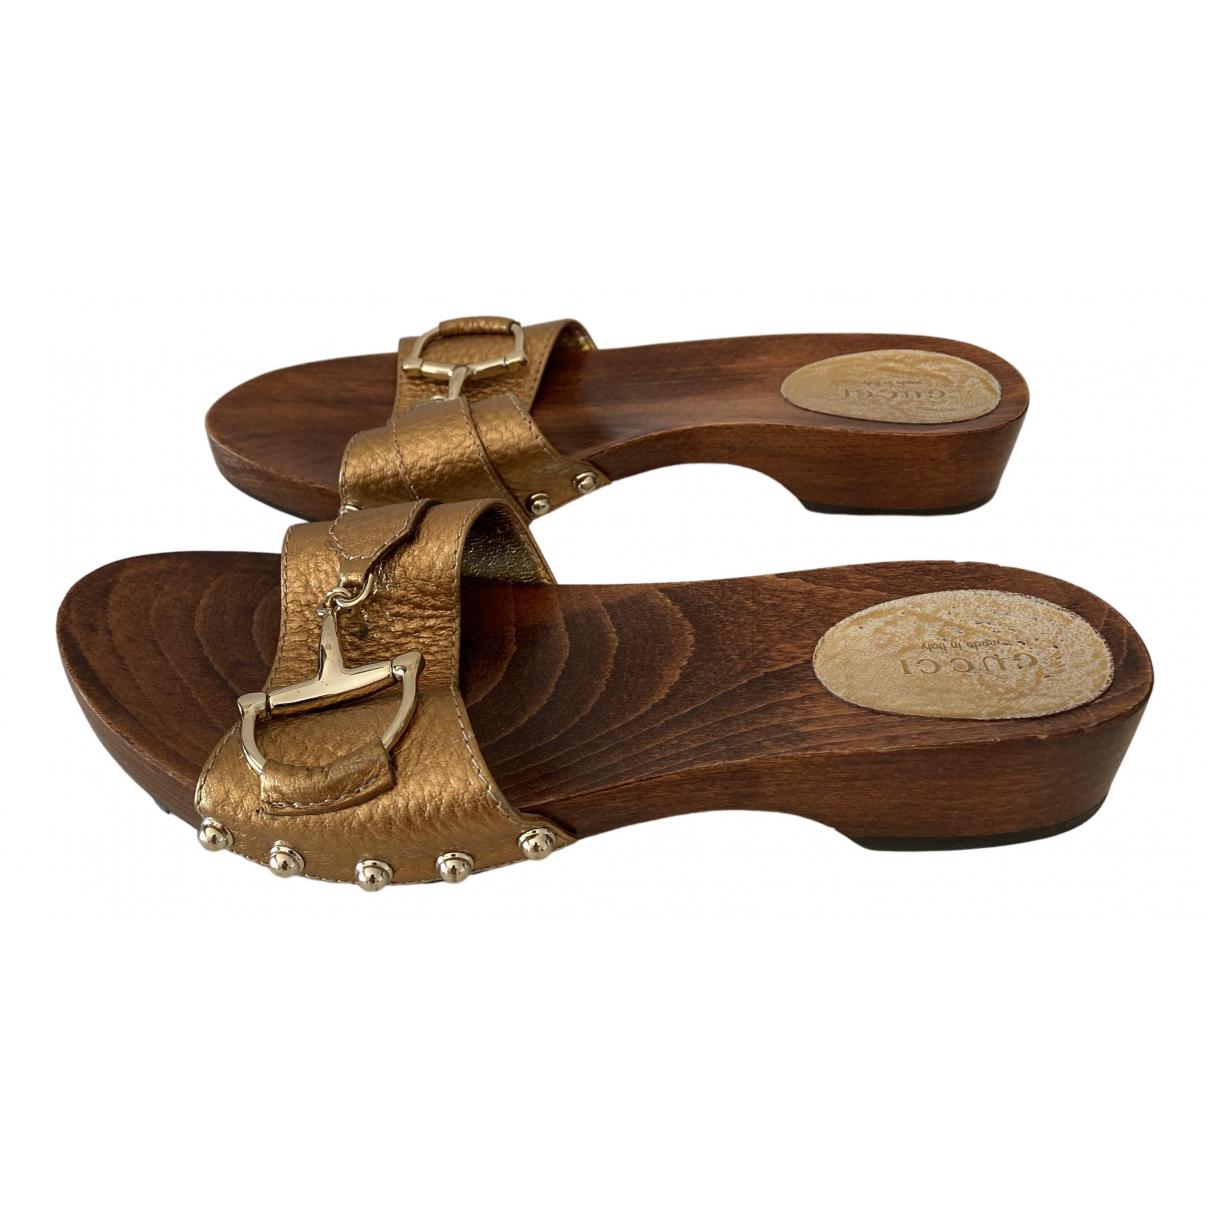 Gucci \N Metallic Leather Mules & Clogs for Women 37 EU